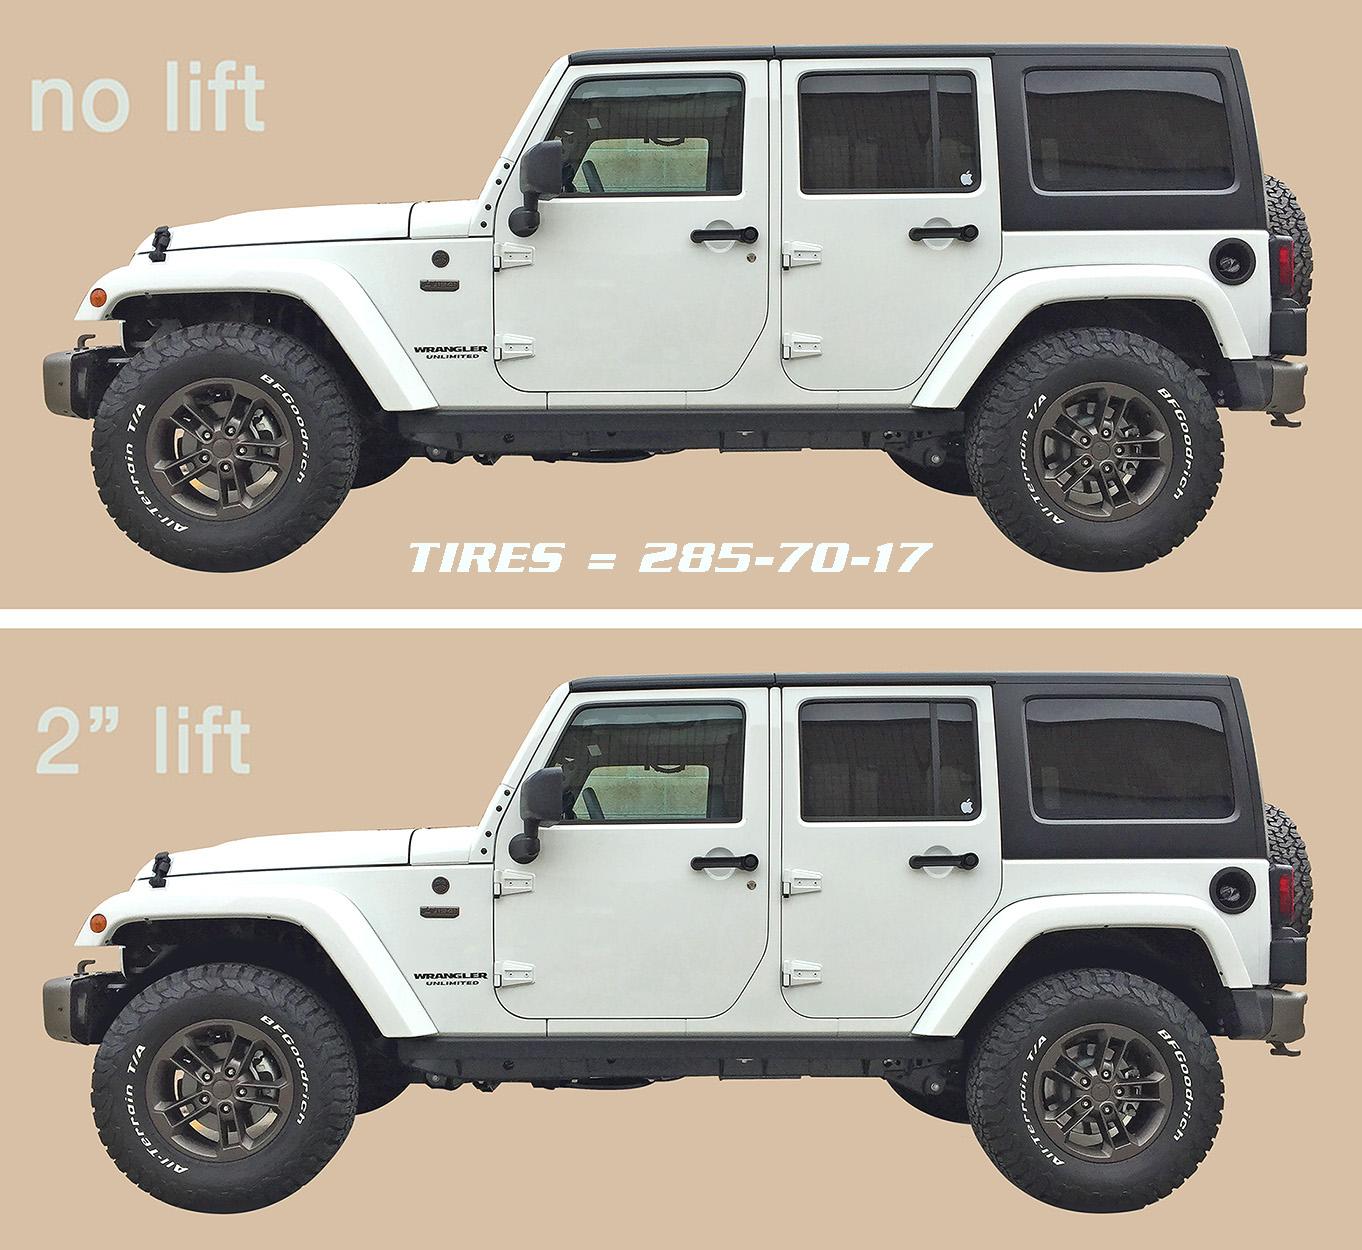 m schultz blog jeep wrangler 2016 before and after 2 inch lift. Black Bedroom Furniture Sets. Home Design Ideas